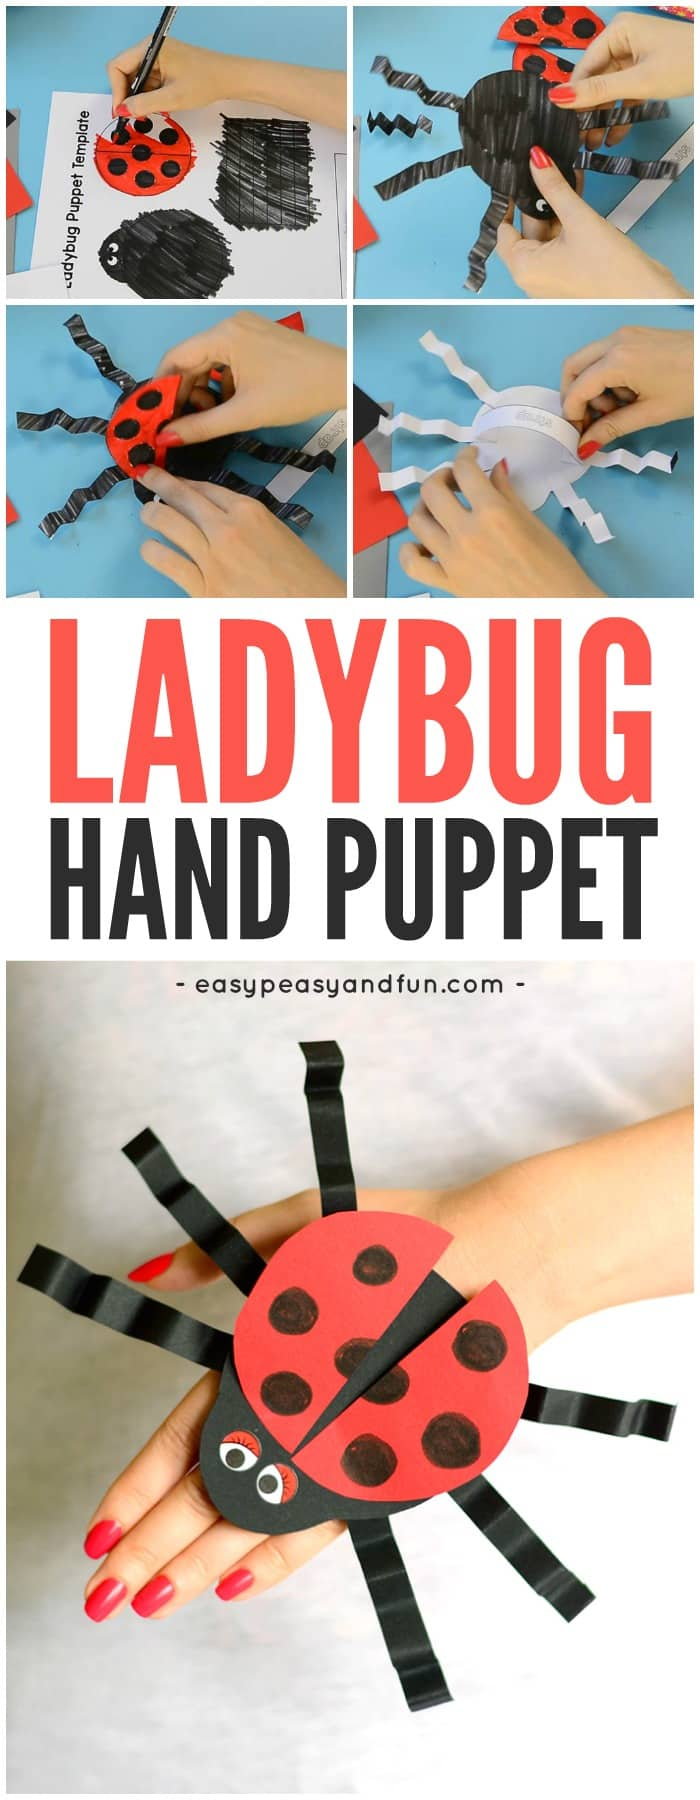 Ladybug Paper Hand Puppet